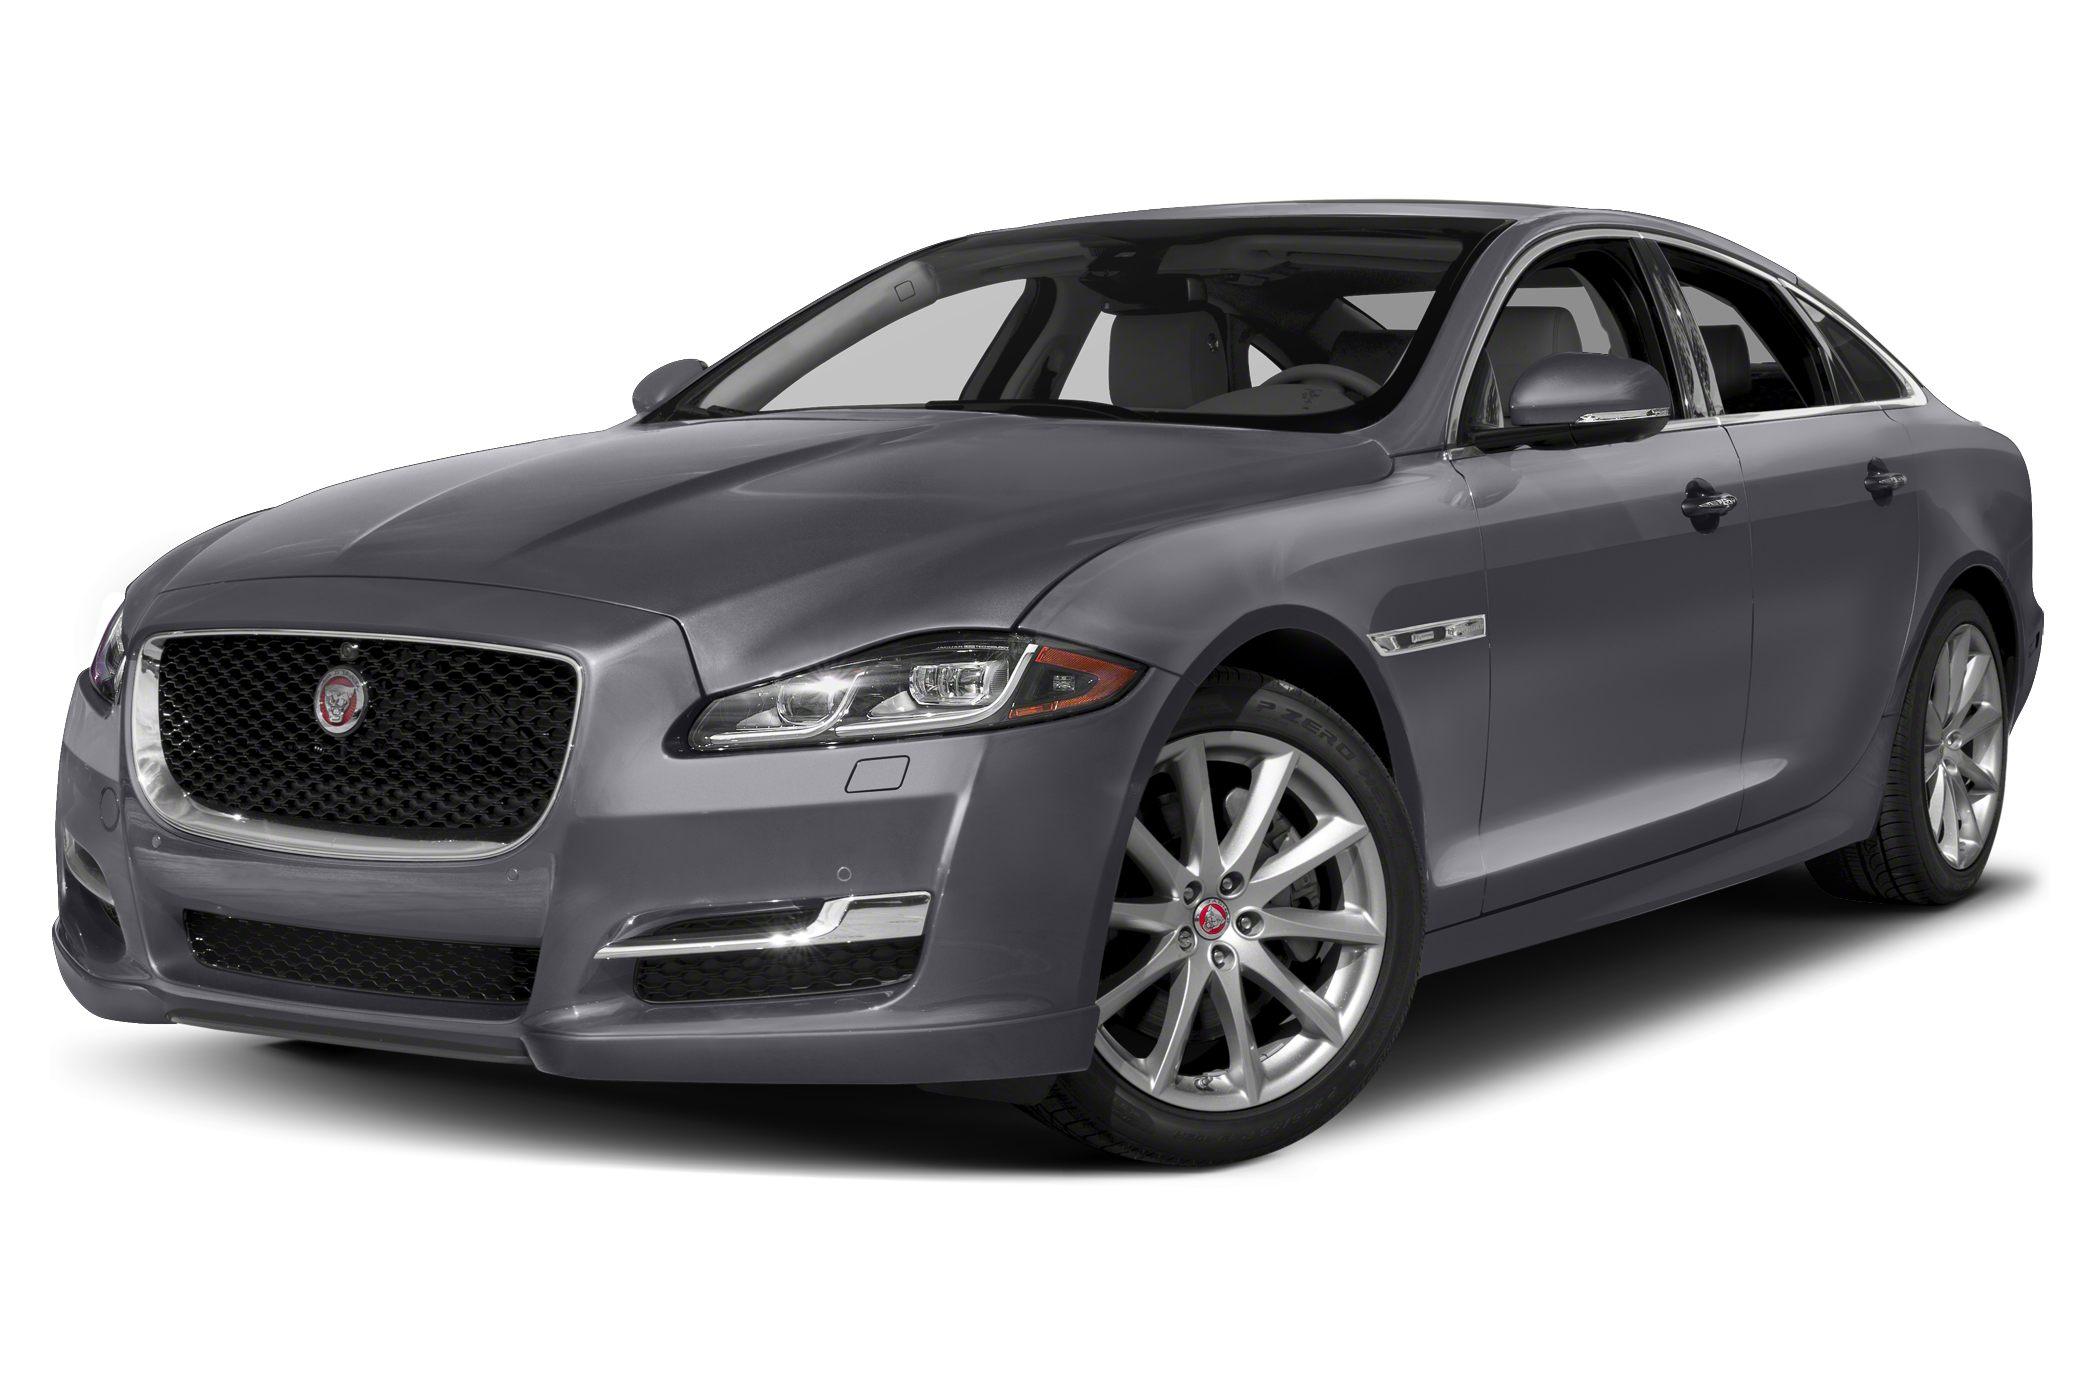 Jaguar Xj Prices Reviews And New Model Information Autoblog